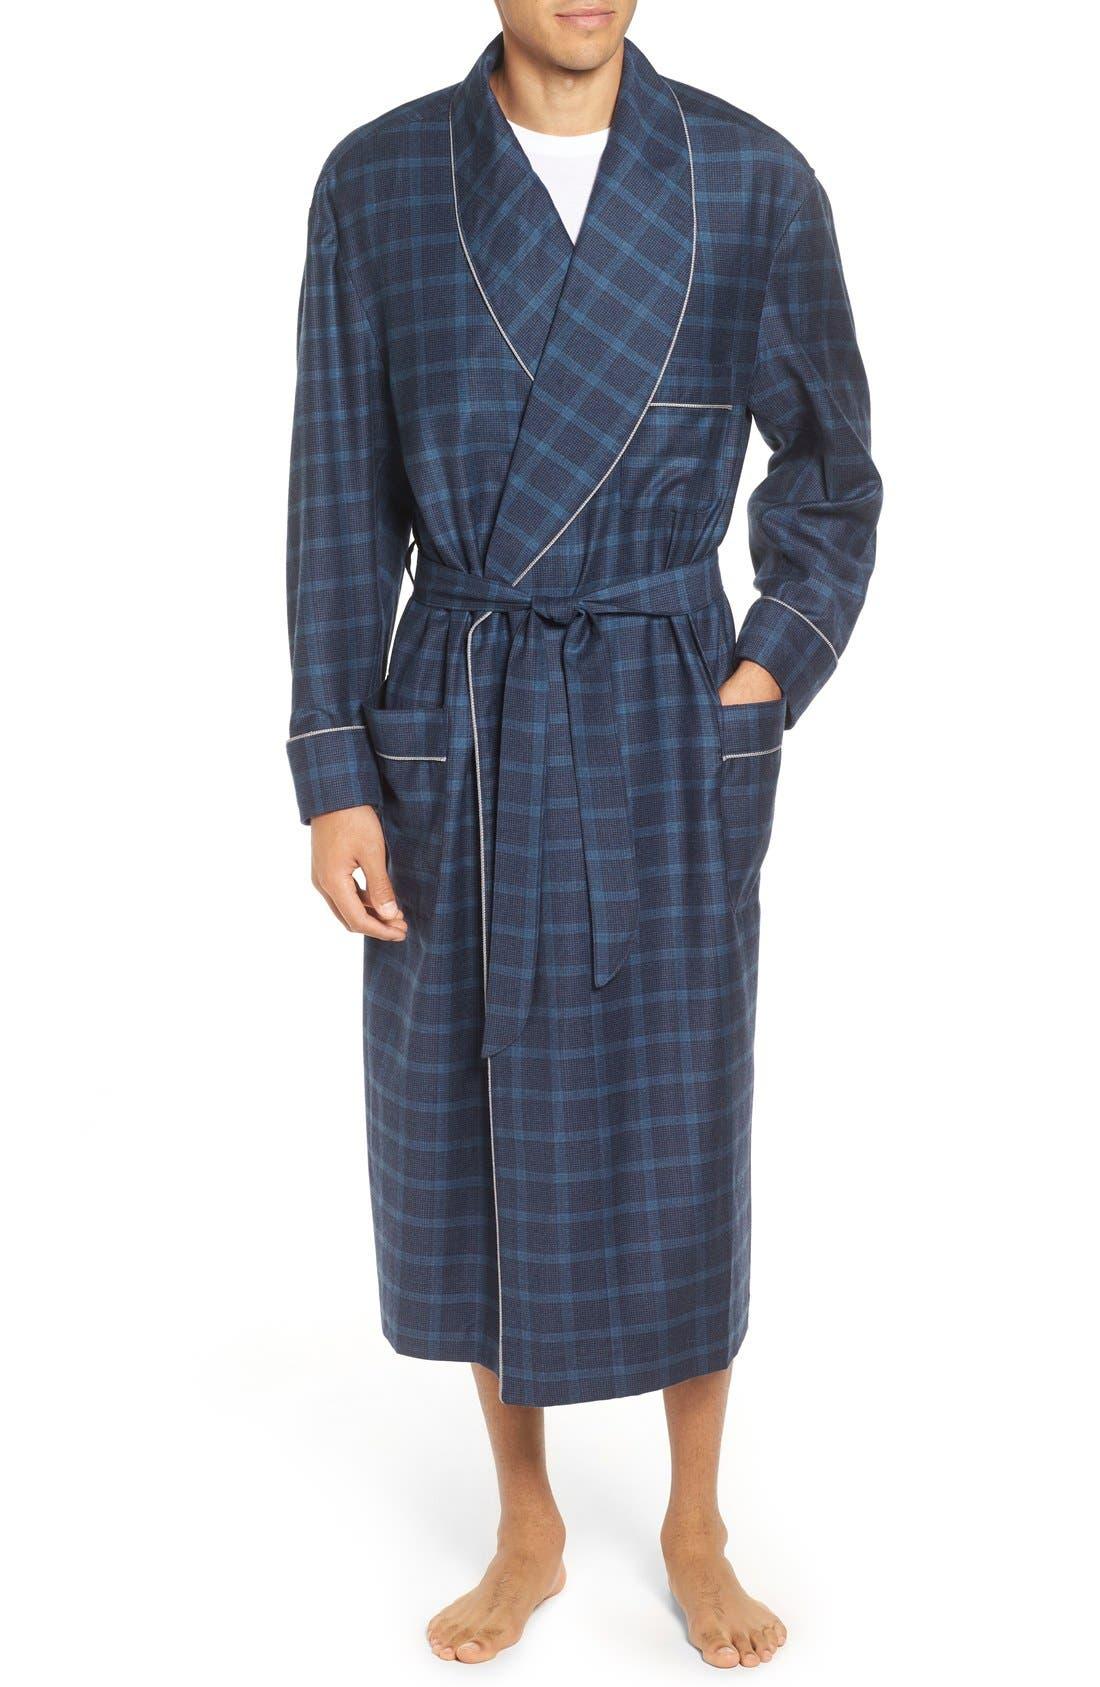 Majestic International Mercer Wool & Cashmere Robe